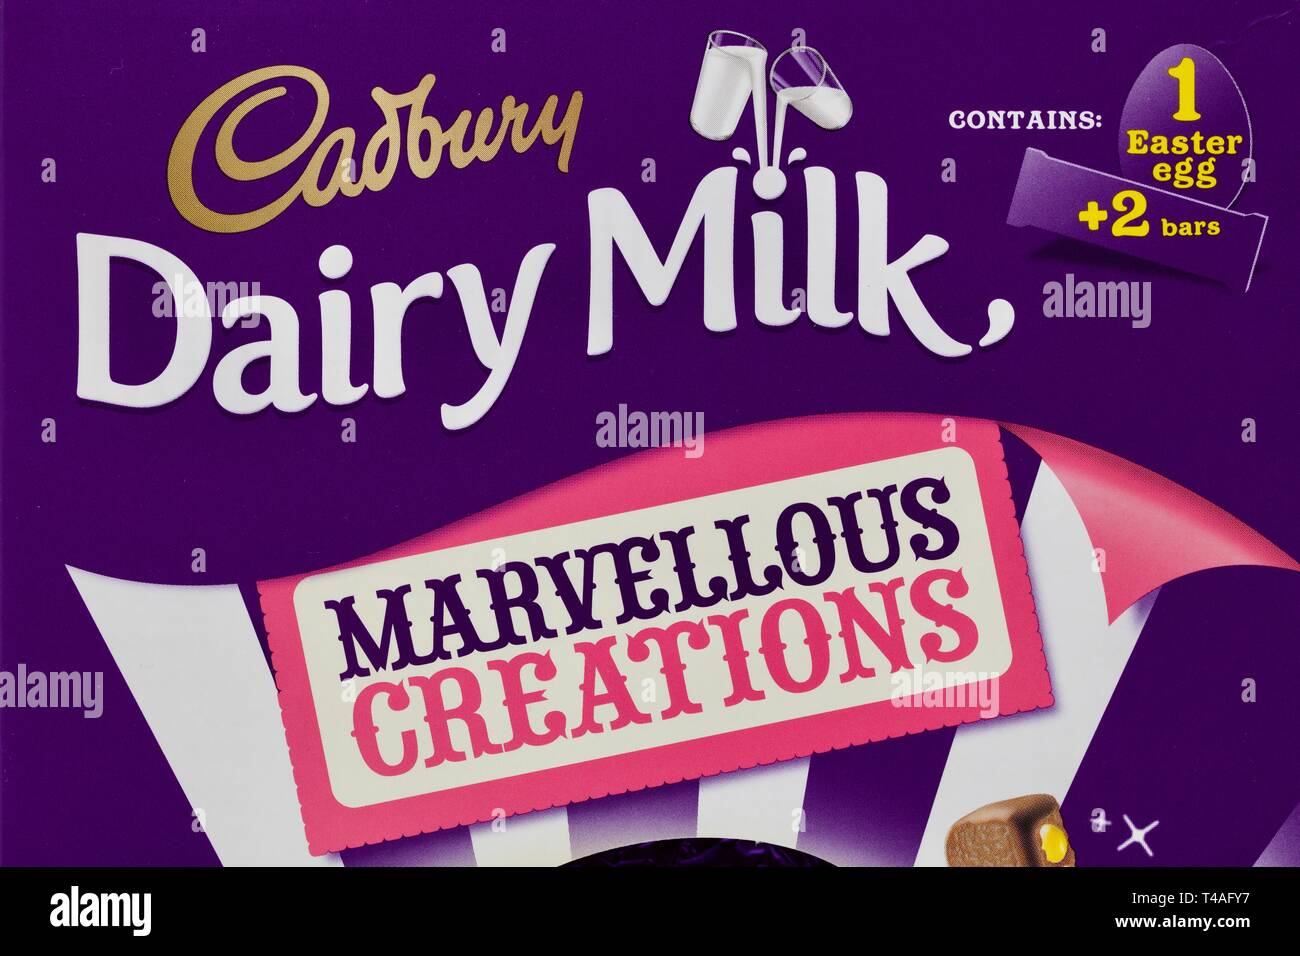 Cadbury Dairy Milk Marvellous Creations Chocolate Easter Egg Packaging - Stock Image